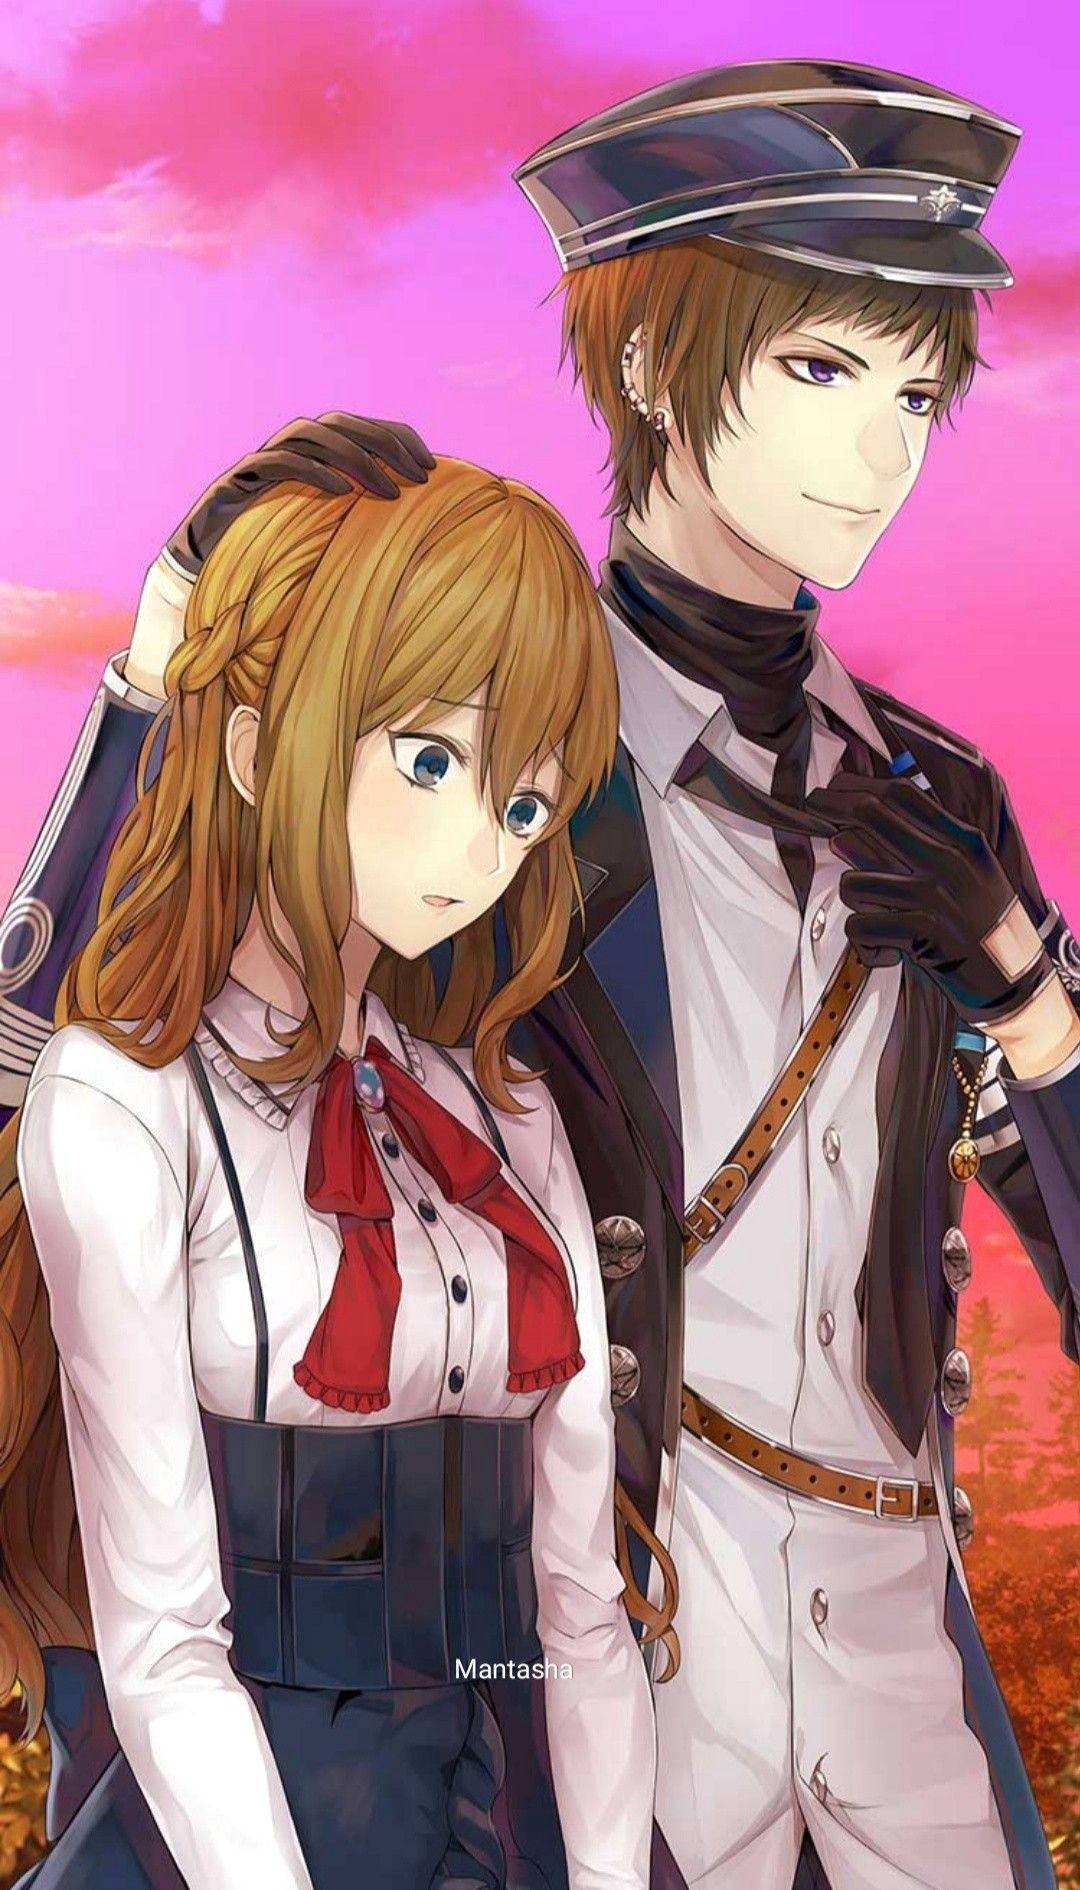 ikemen revolution anime couple anime boy anime girl cybird otome game novel